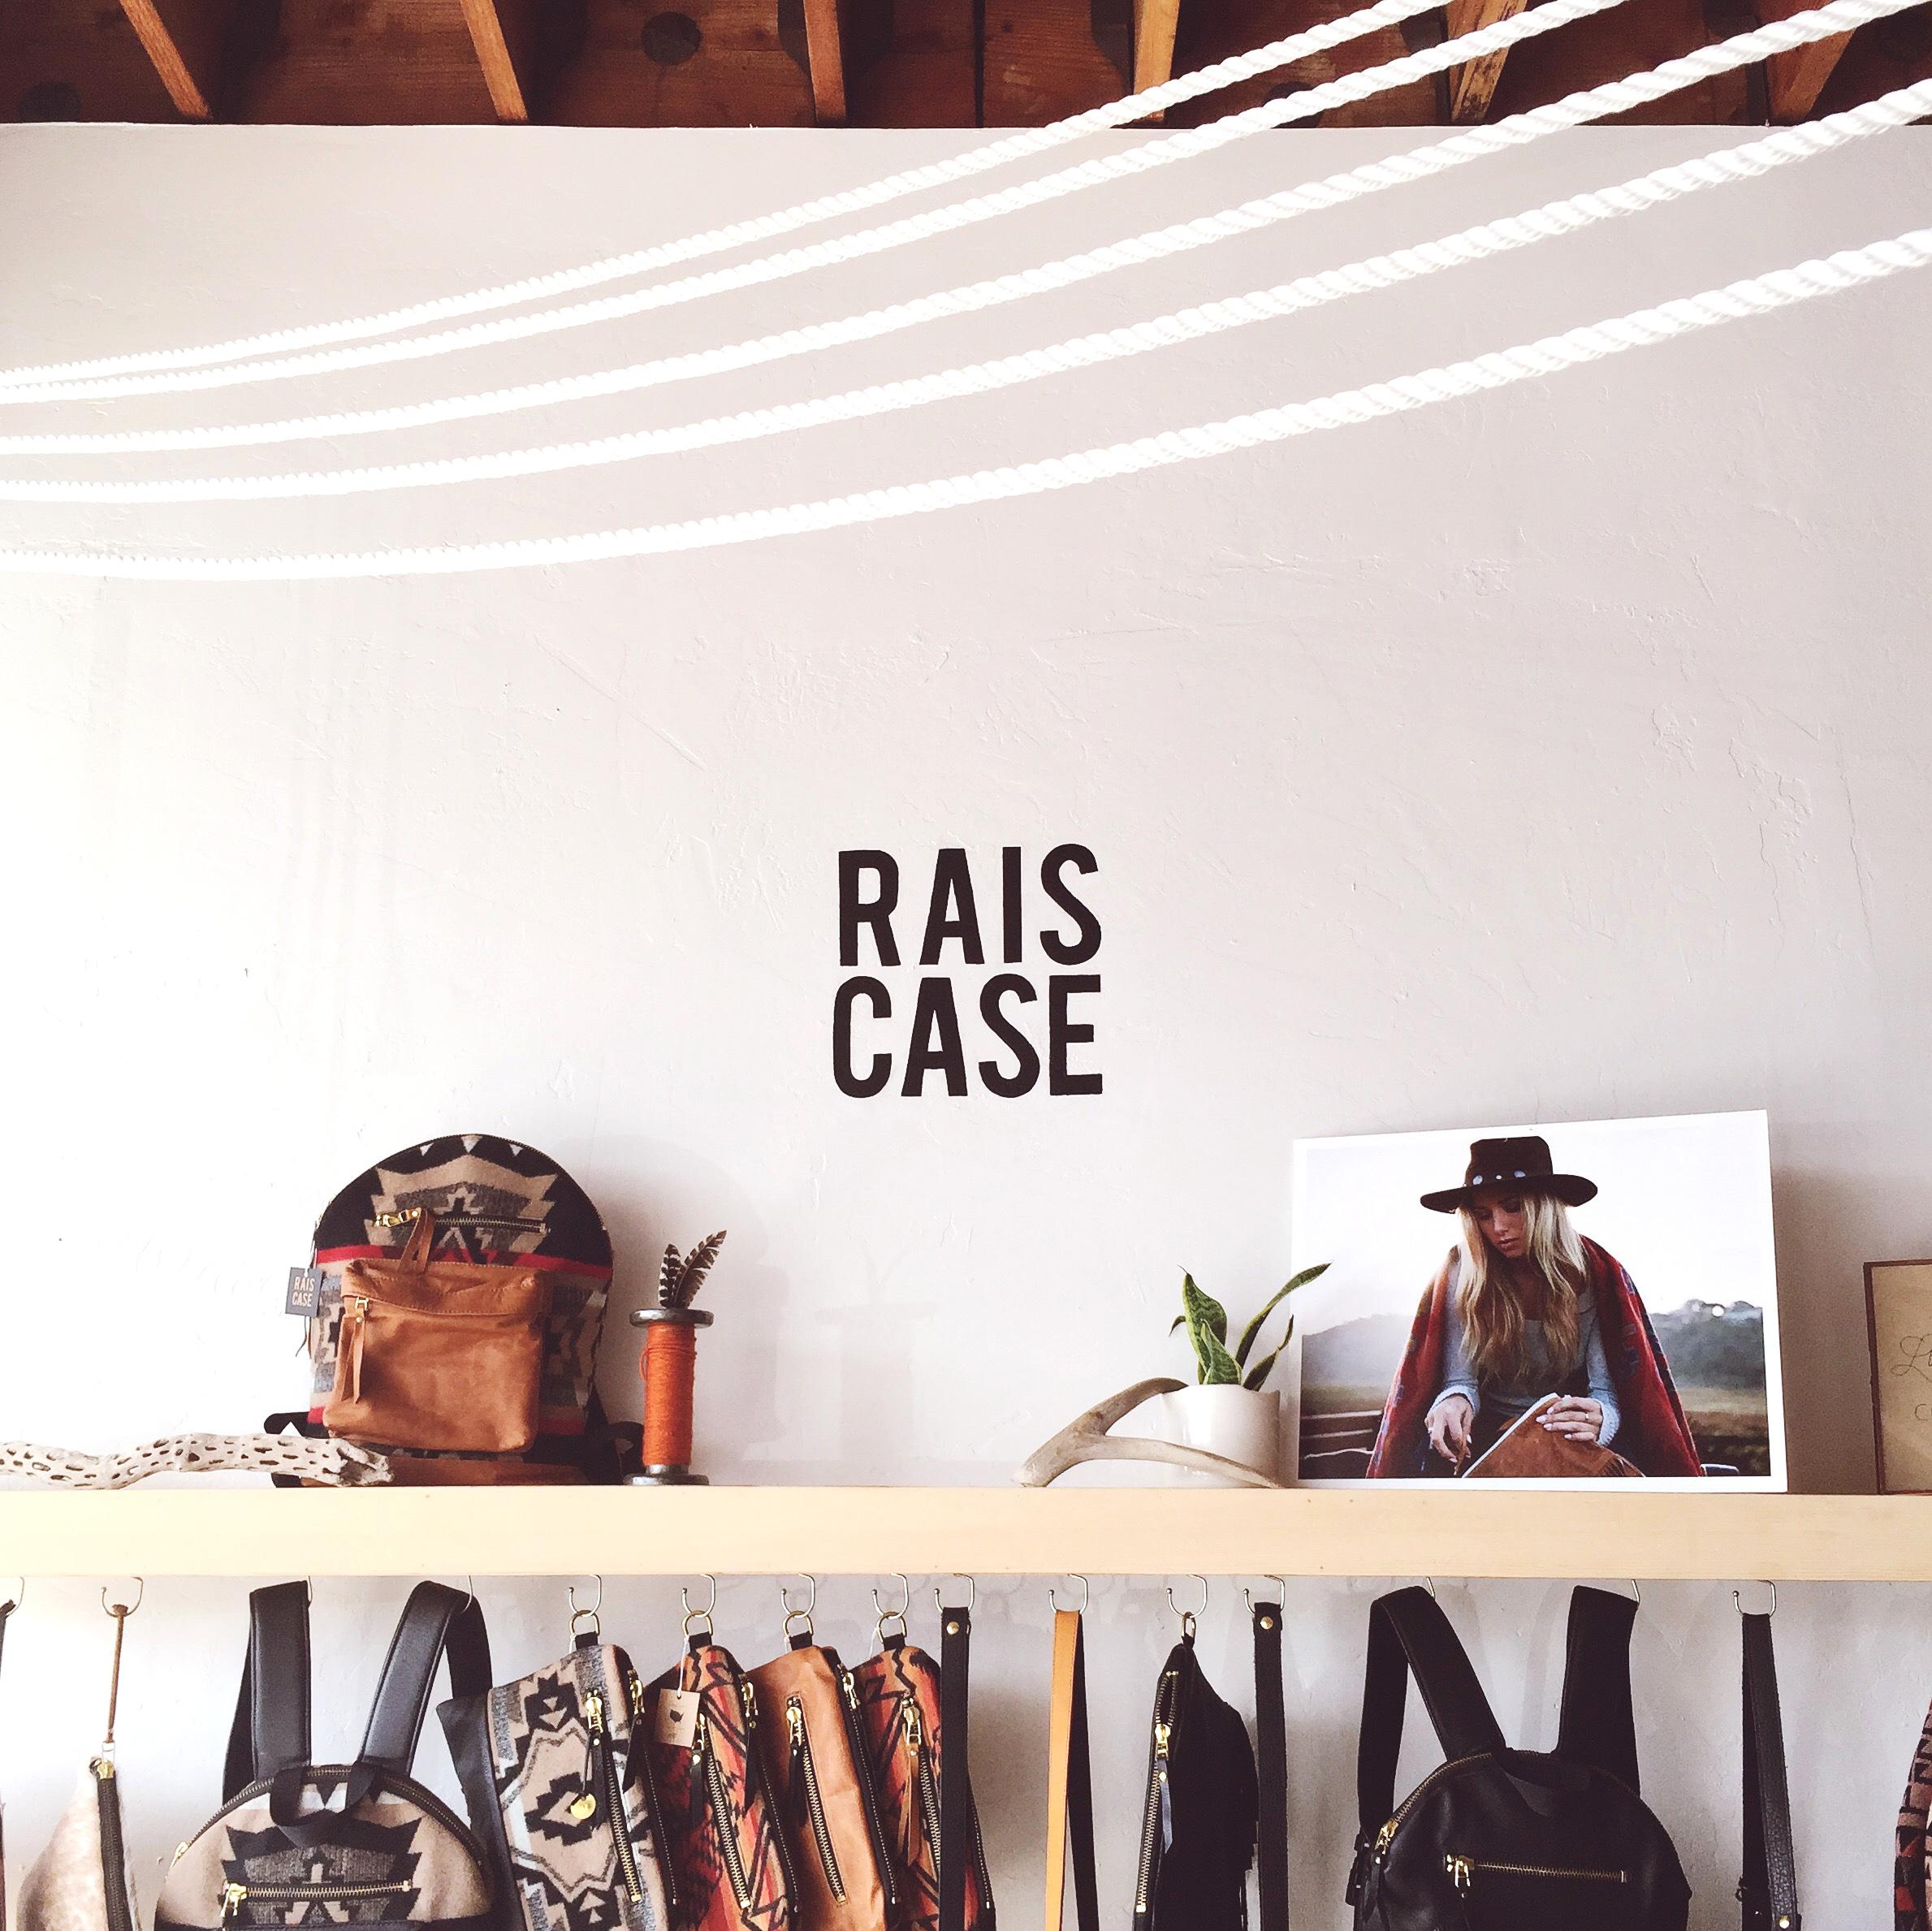 raiscase_wall_logo 2.JPG